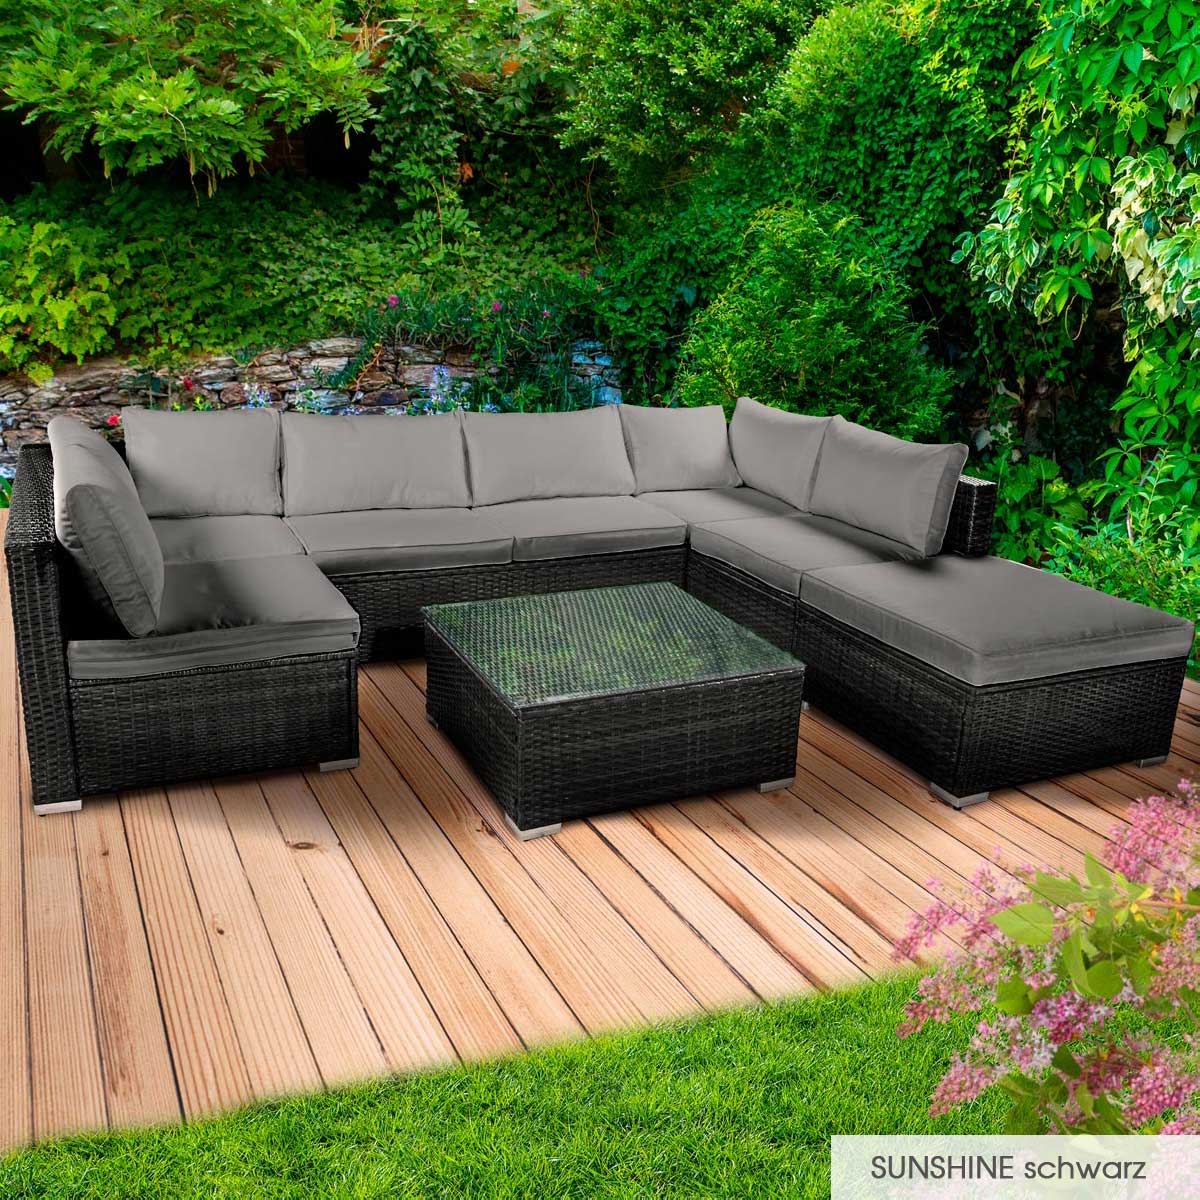 Gartenmoebel-Poly-Rattan-Lounge-Moebel-Sitzgarnitur-Gartengarnitur-Sitzgruppe-Sofa Indexbild 25